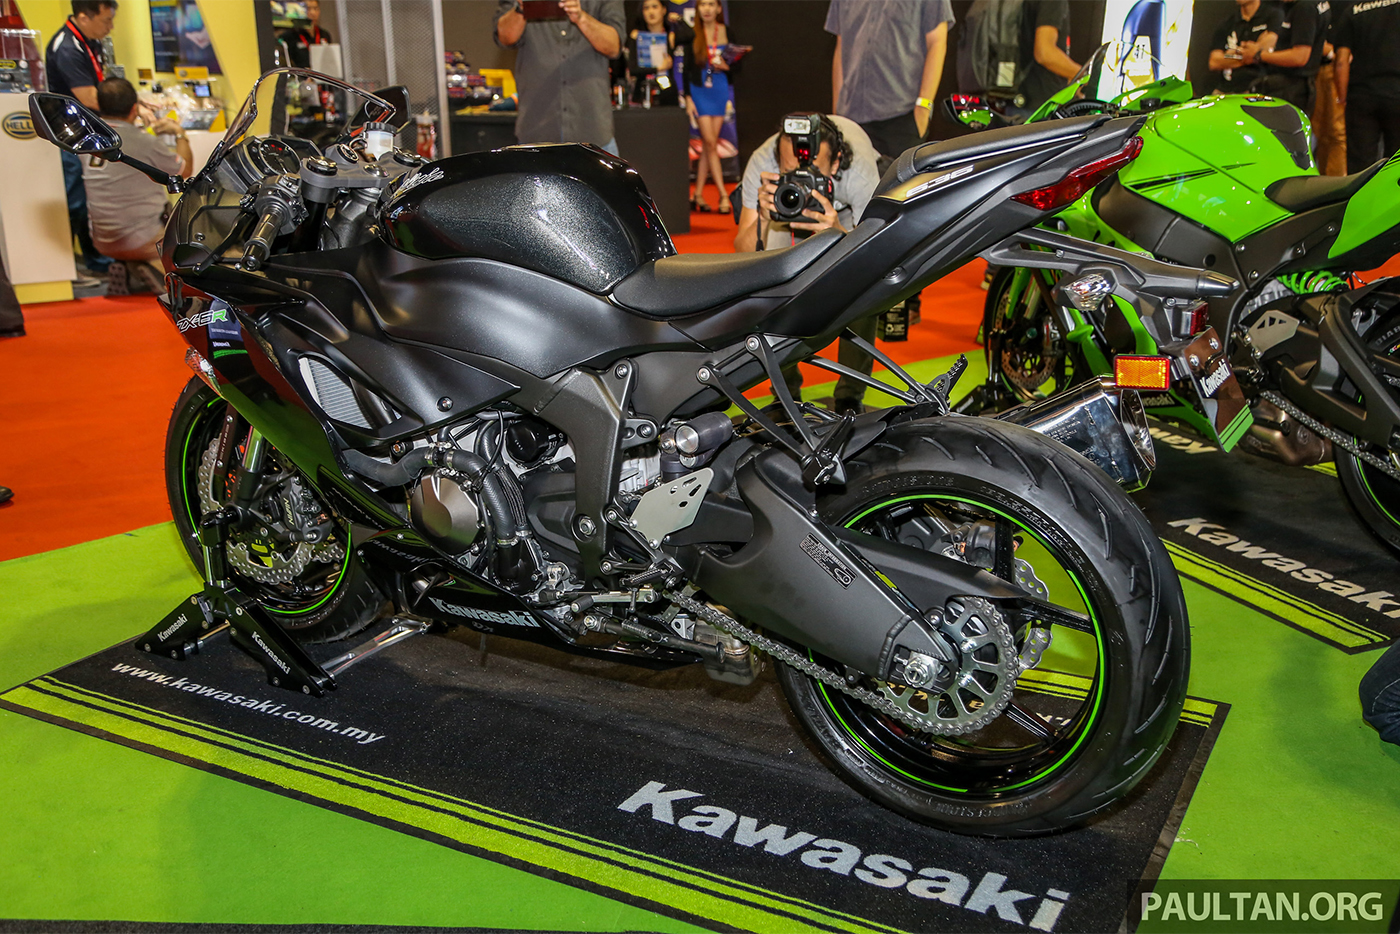 kawasaki-ninja-zx-6r-2019-4.jpg